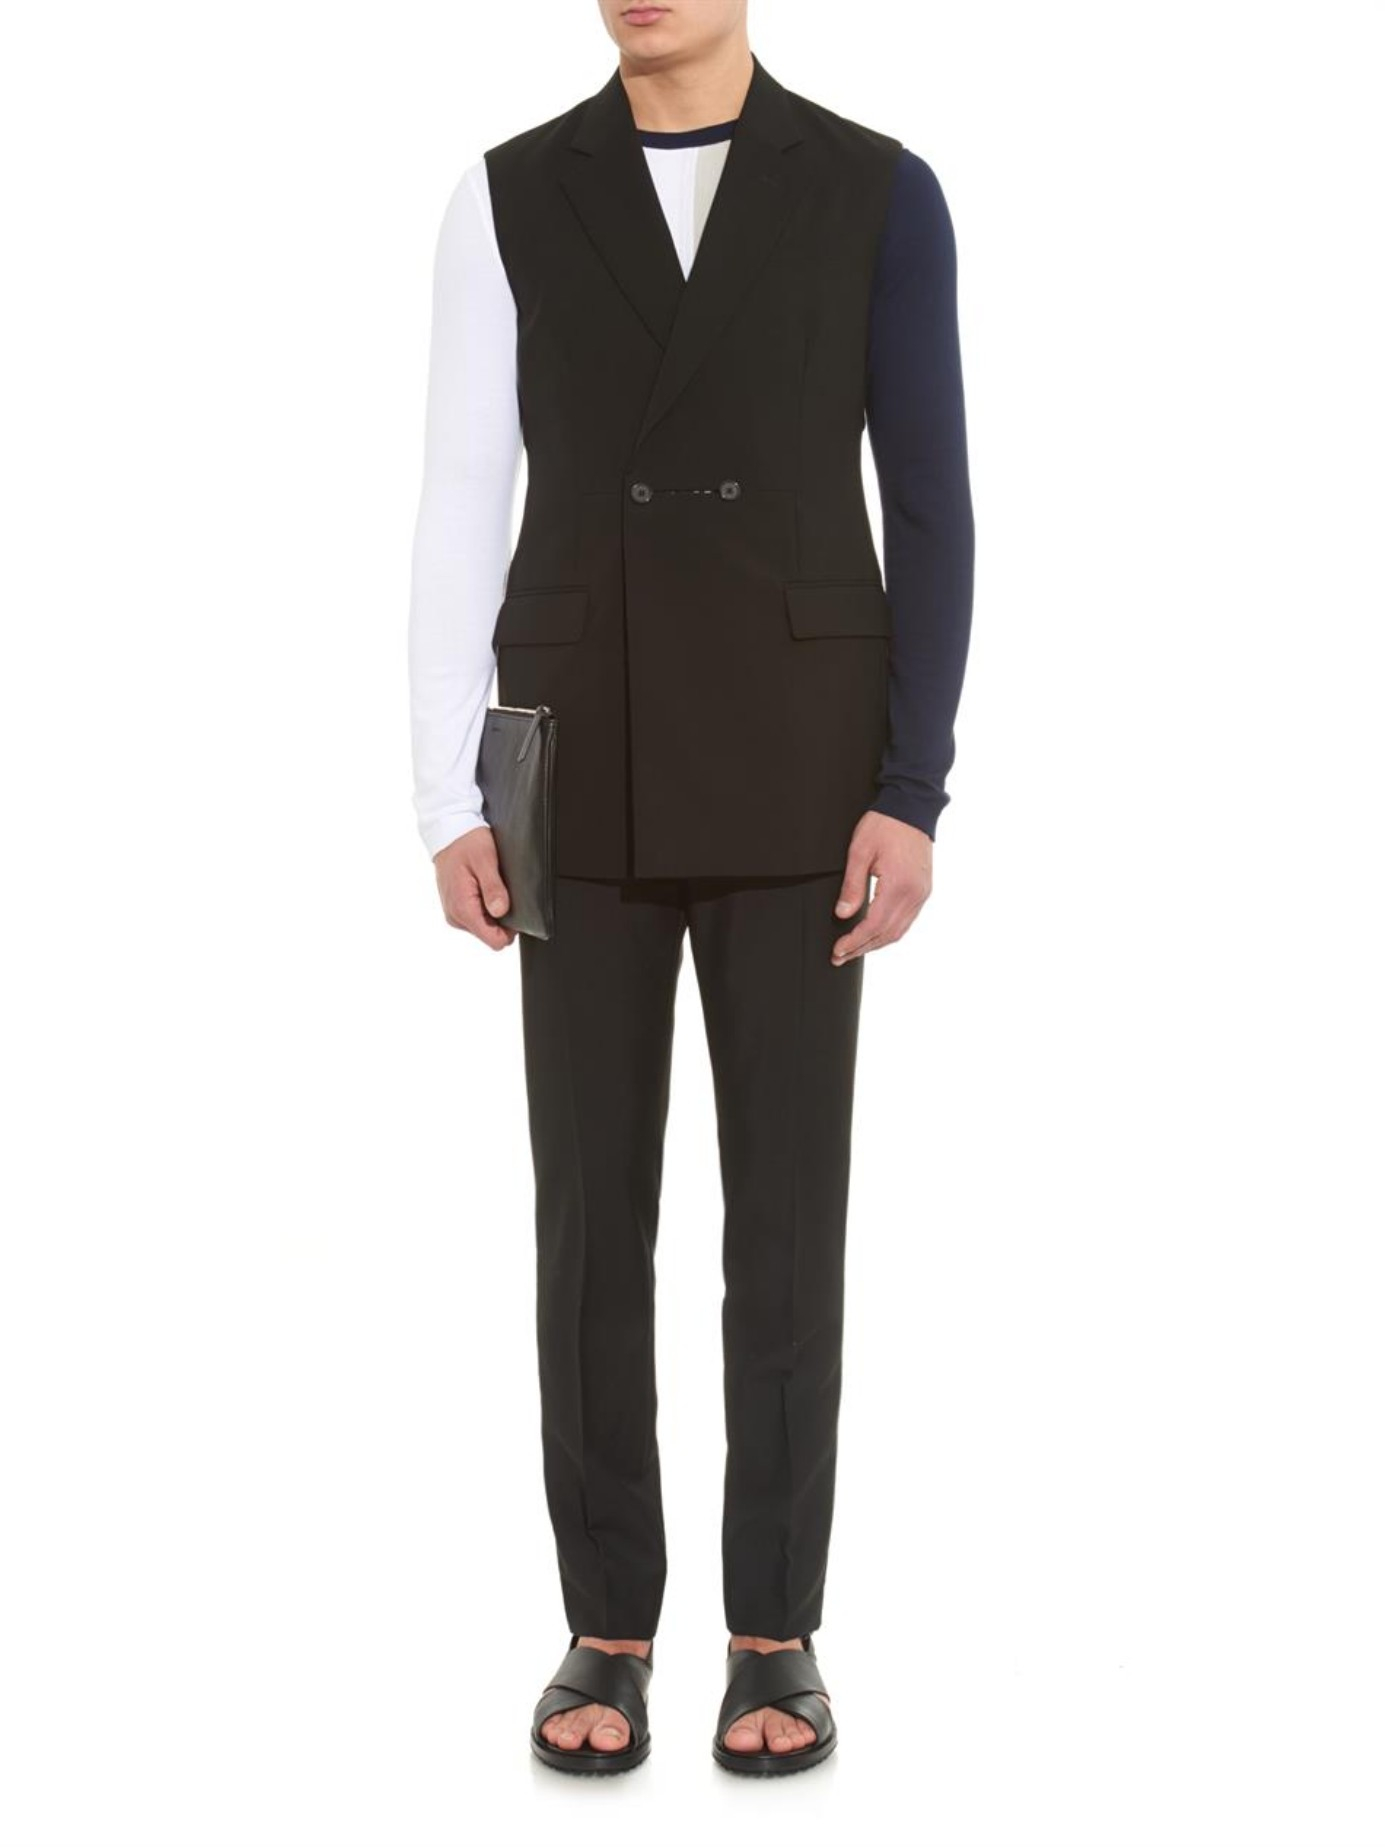 raf simons button detail sleeveless wool blazer in black for men lyst. Black Bedroom Furniture Sets. Home Design Ideas